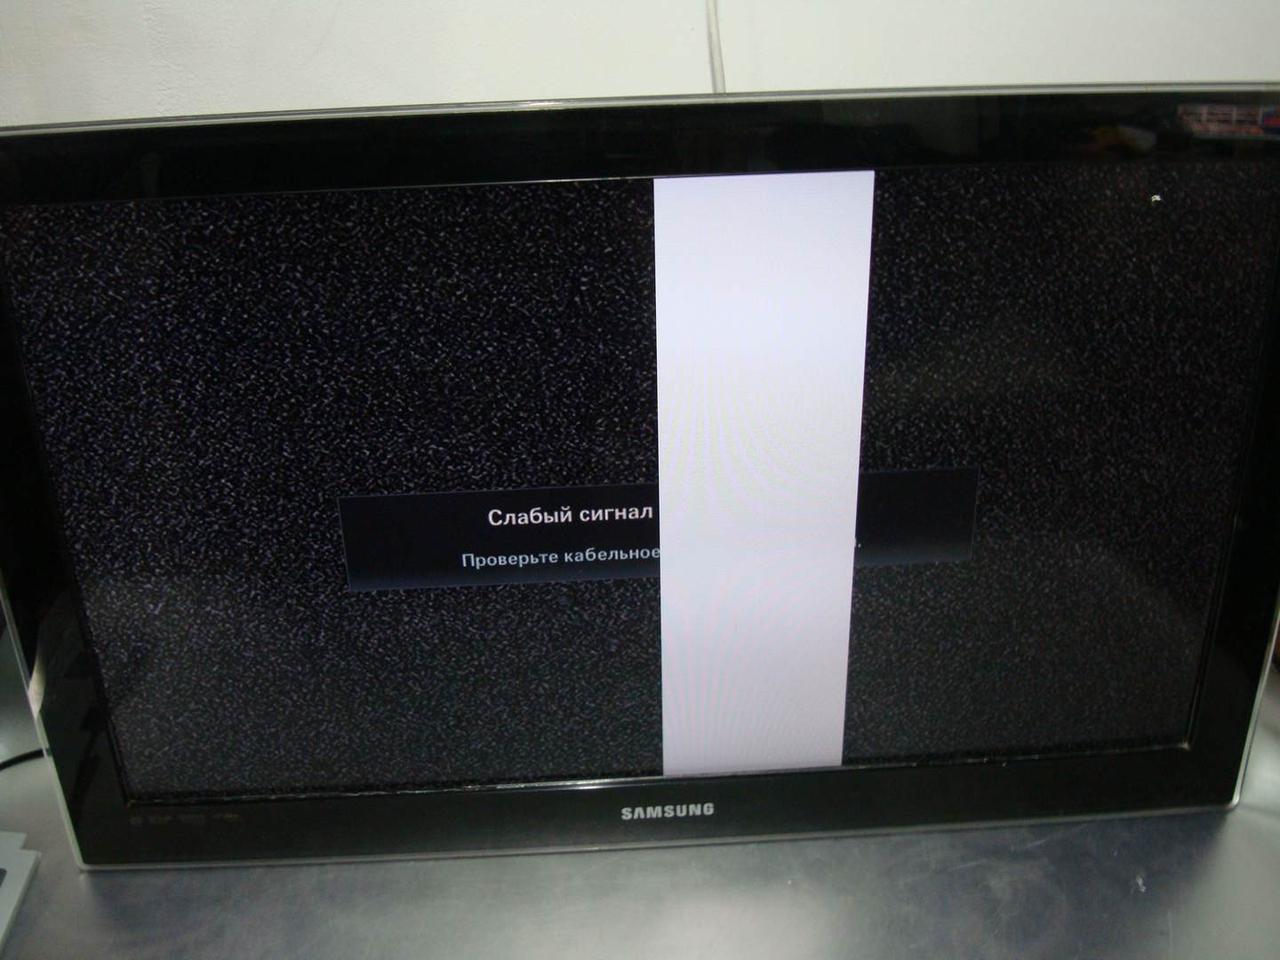 Матрица  LTF320HF01 к телевизору Samsung LE32C630K1W с дефектом